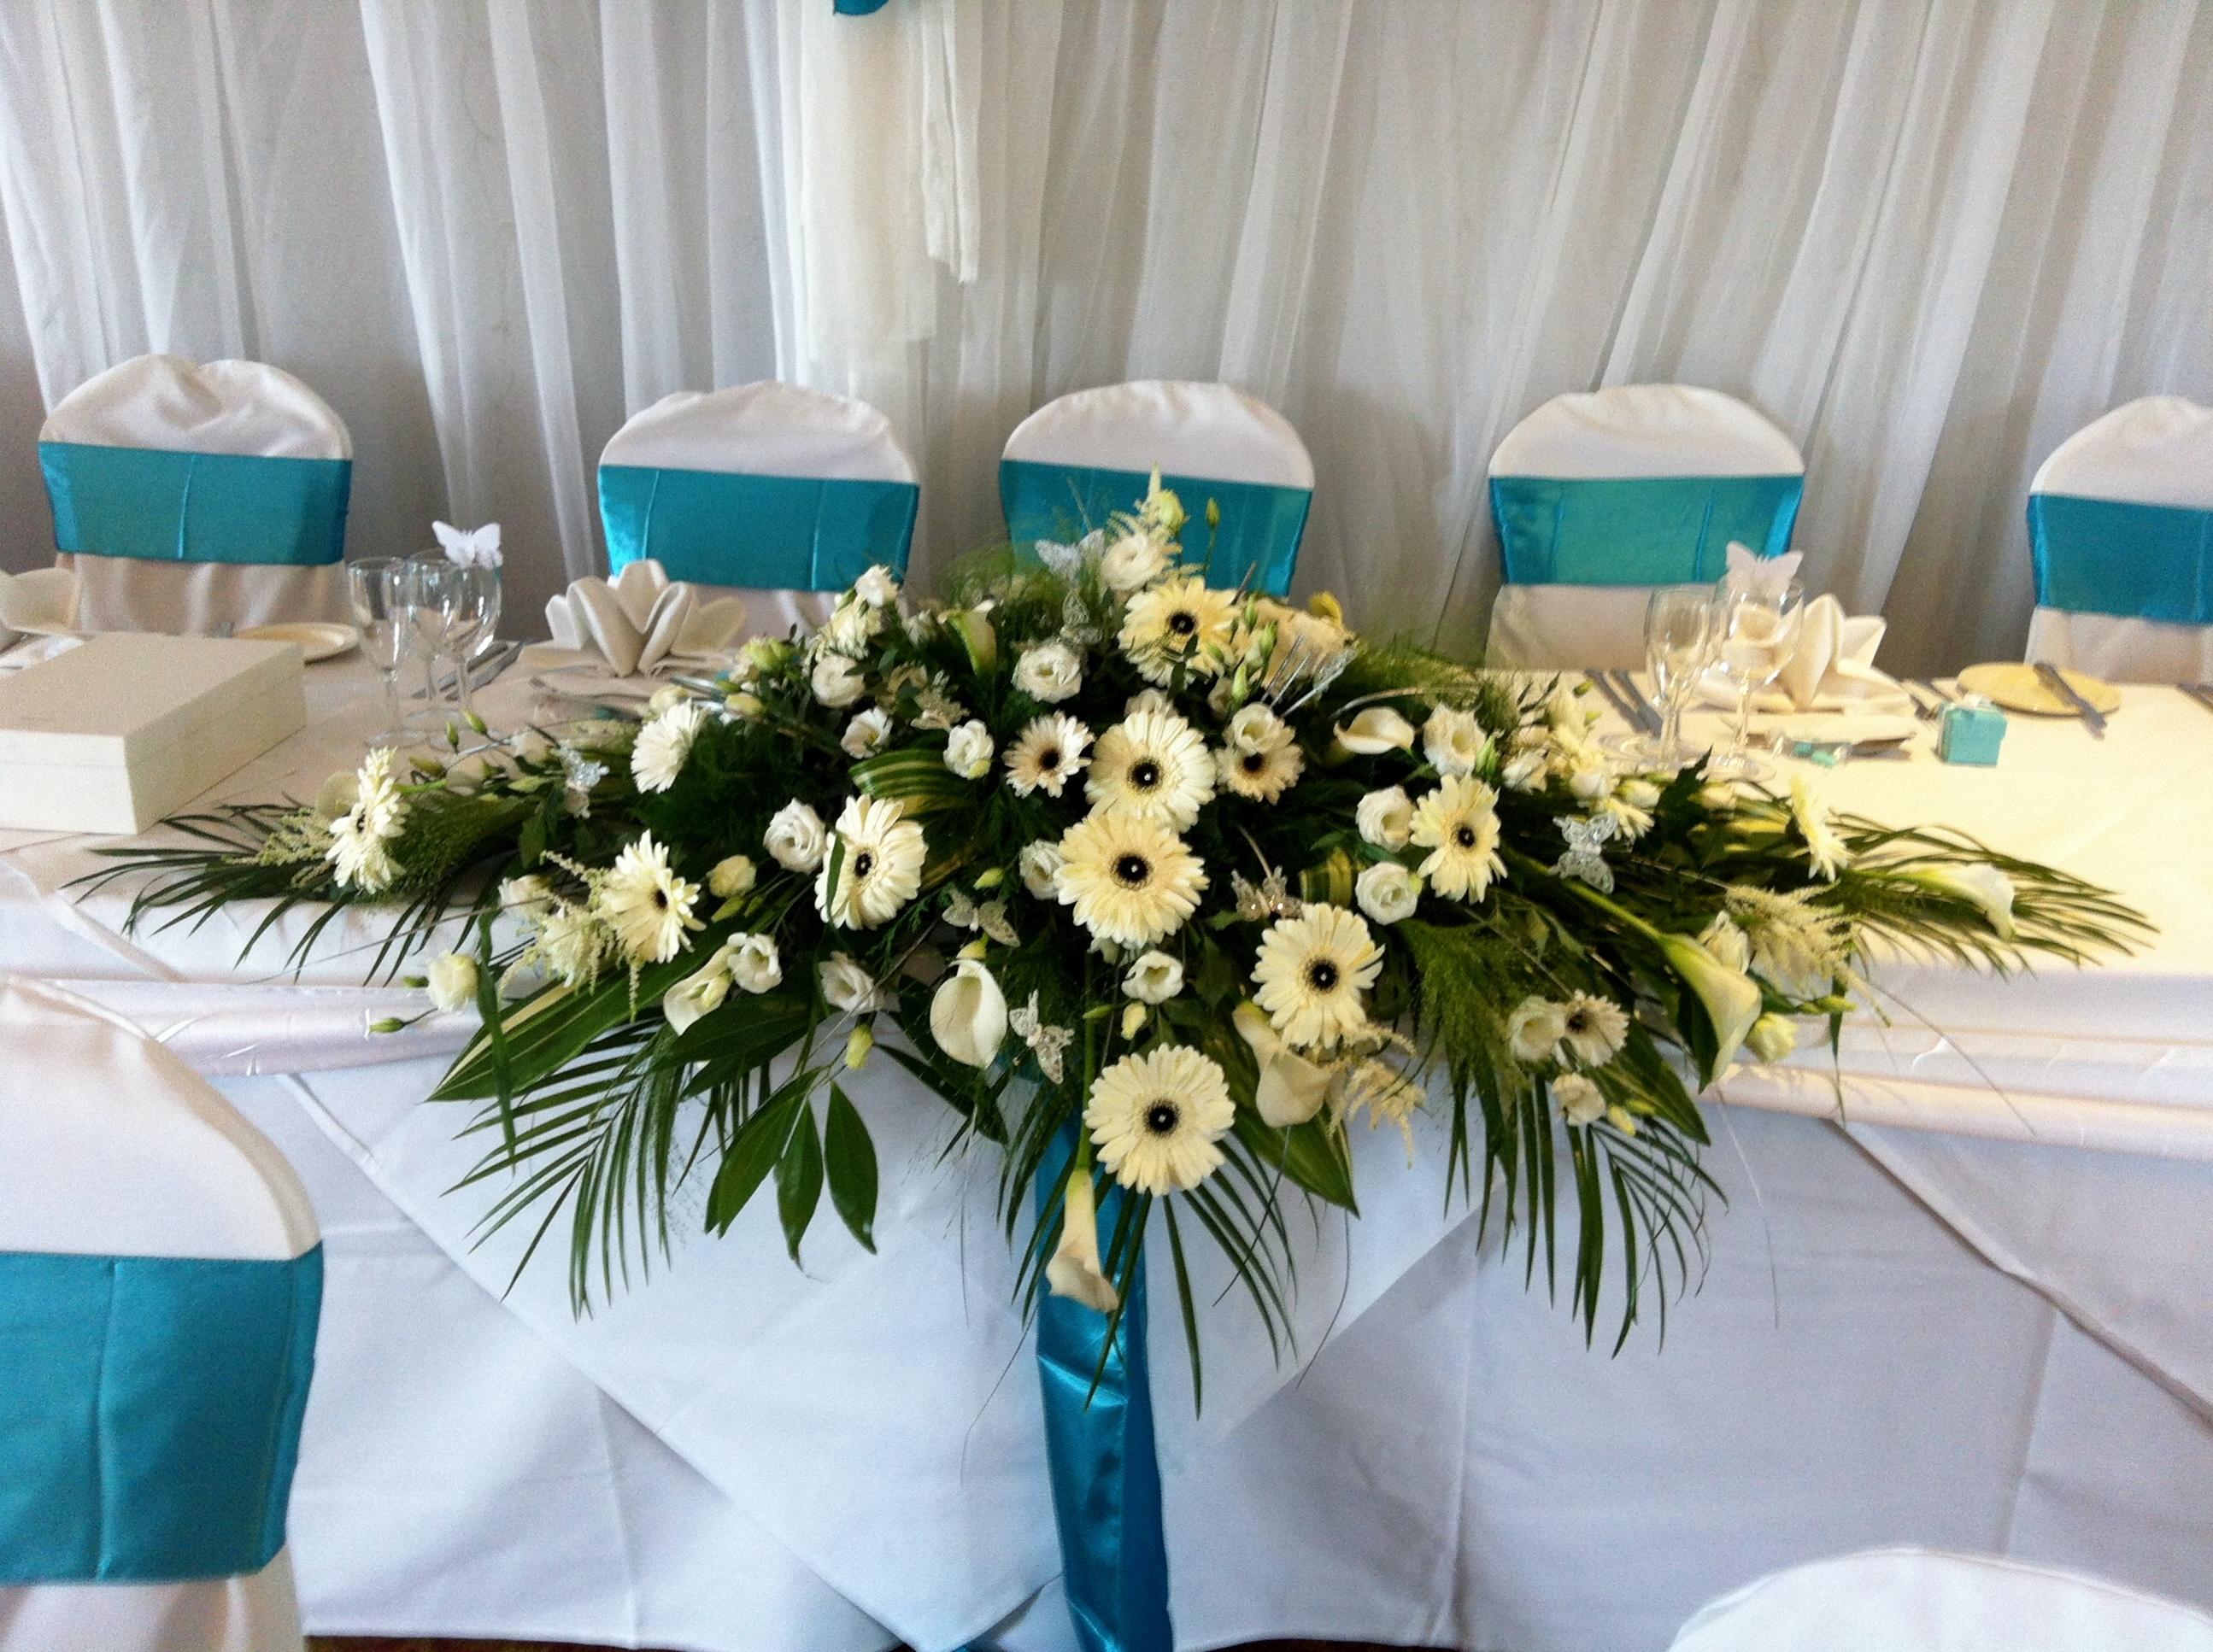 Top Table Arrangements Belper Florist Derby Flowers